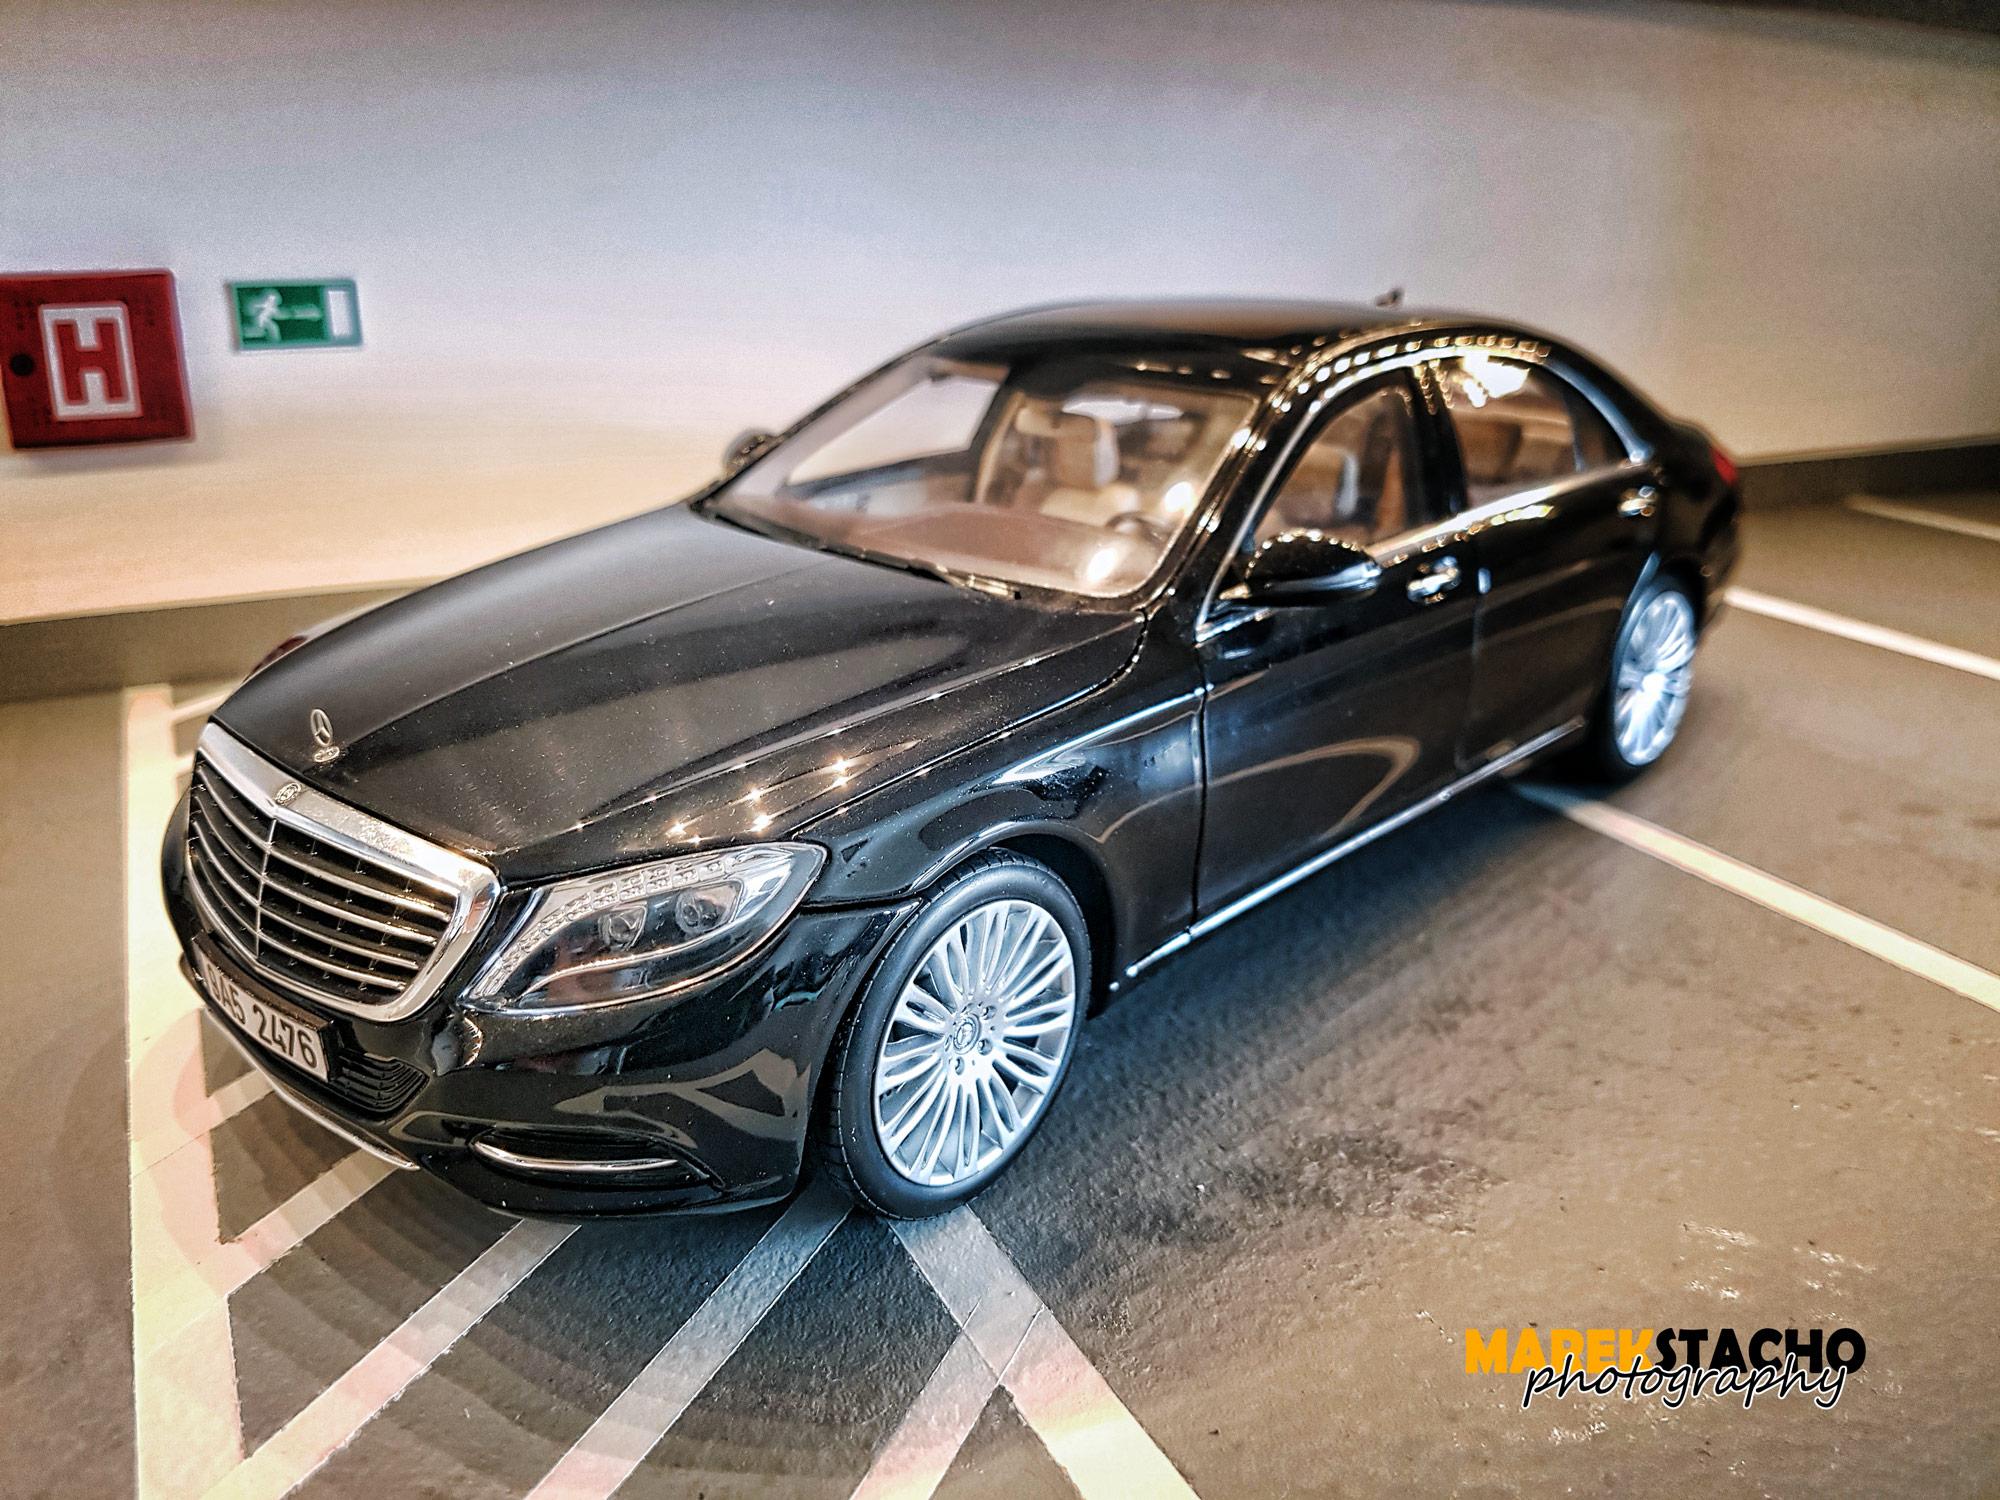 2014 mercedes benz s class s550 black 118 norev - Mercedes Benz 2014 S Class Black